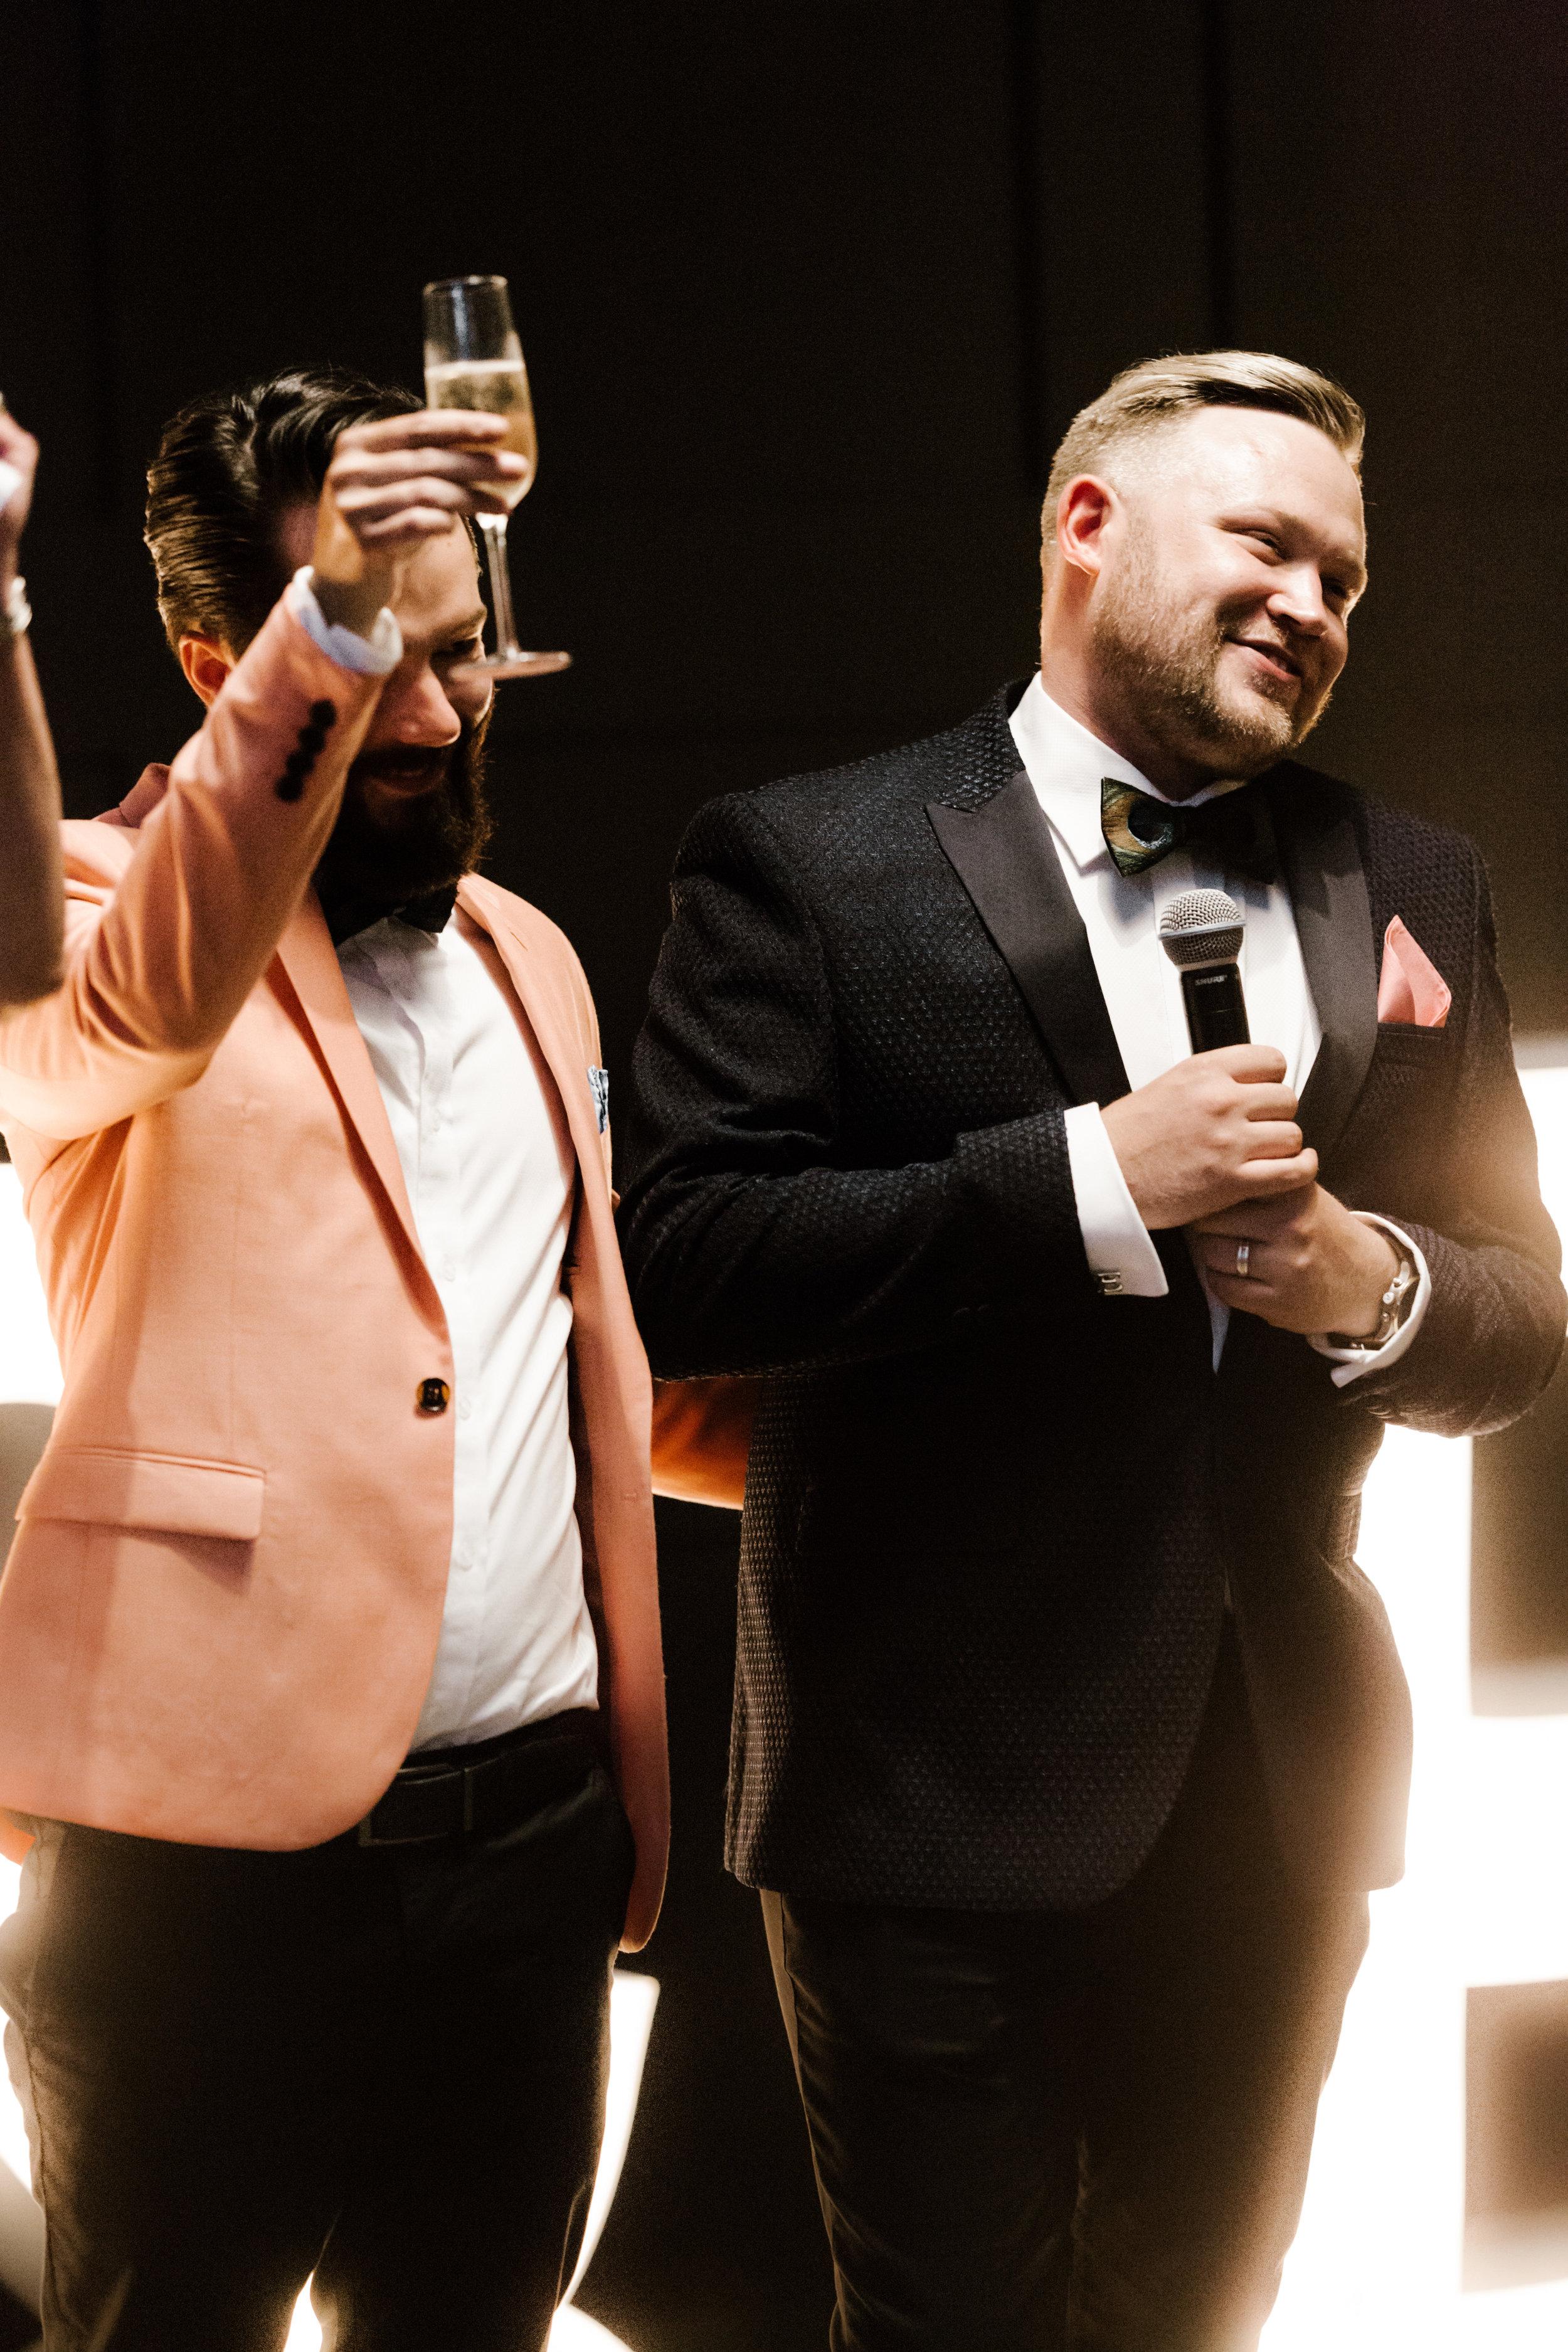 Adam+Eddie - Melbourne Same-Sex Engagement - Alto Event Space - Photographer: Dave Lepage